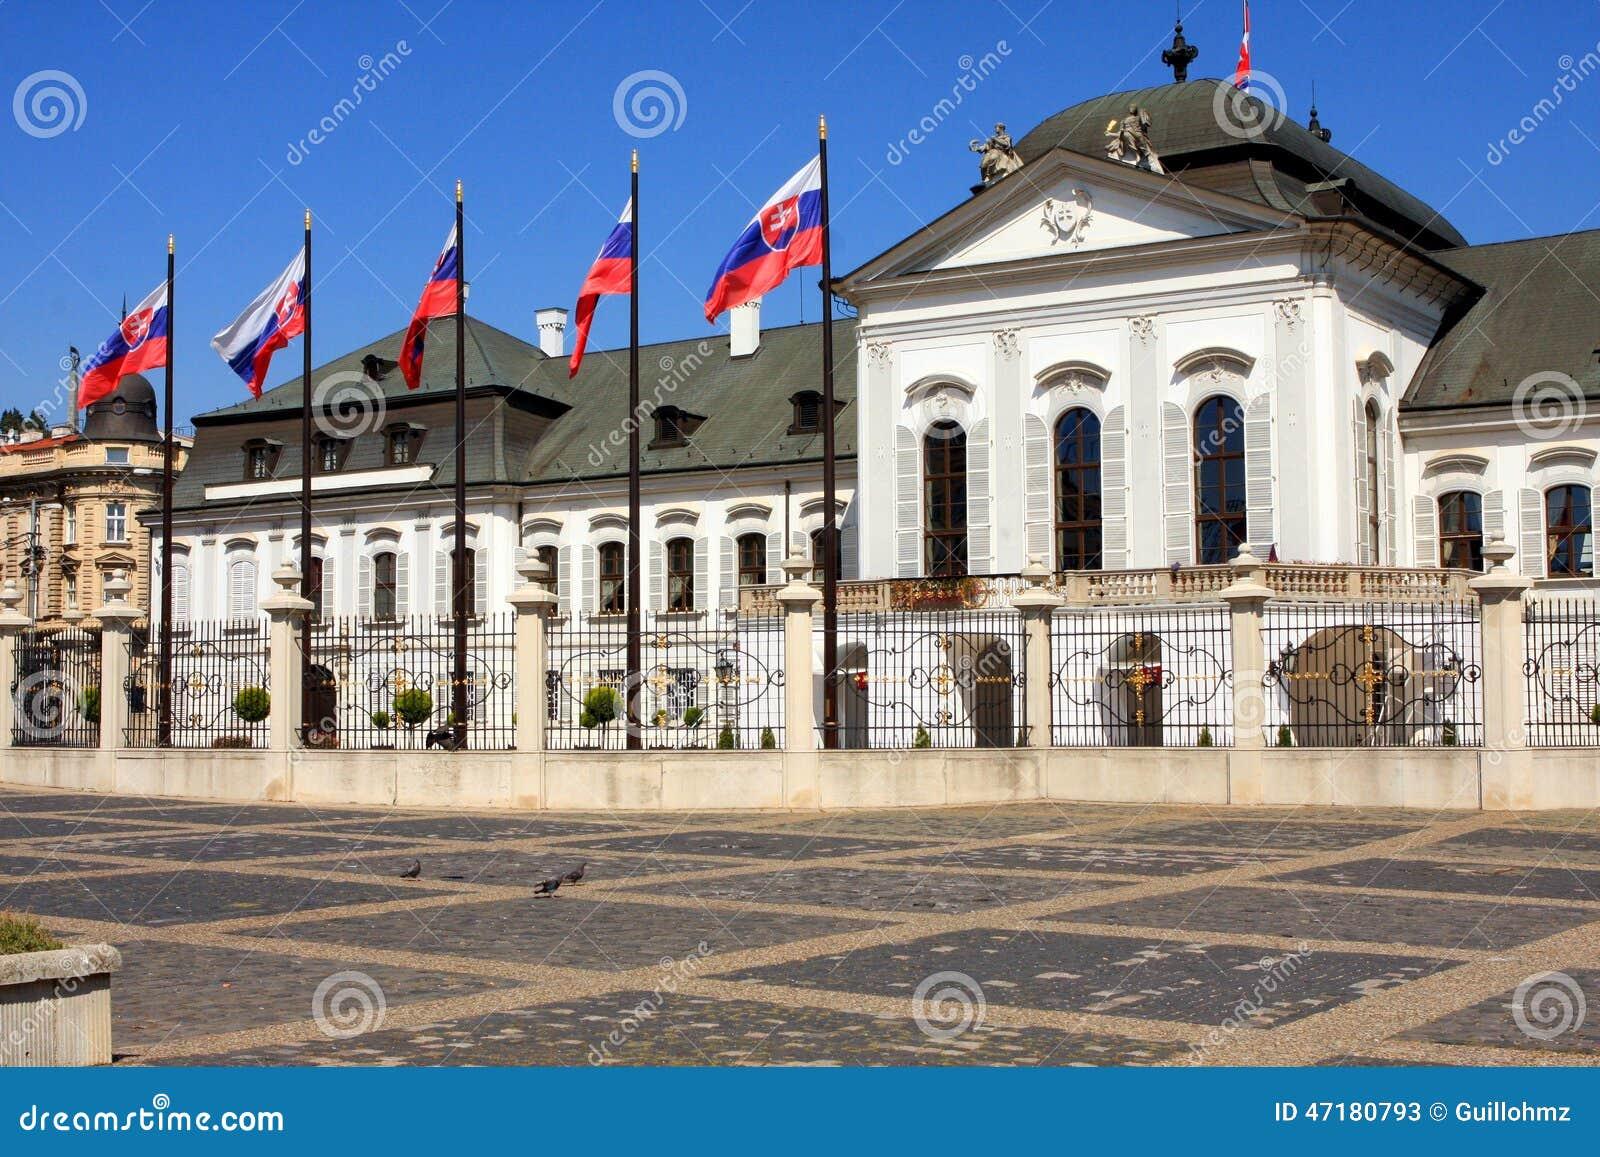 Presidentieel paleis in bratislava stock foto afbeelding for Design hotel 21 bratislava kontakt